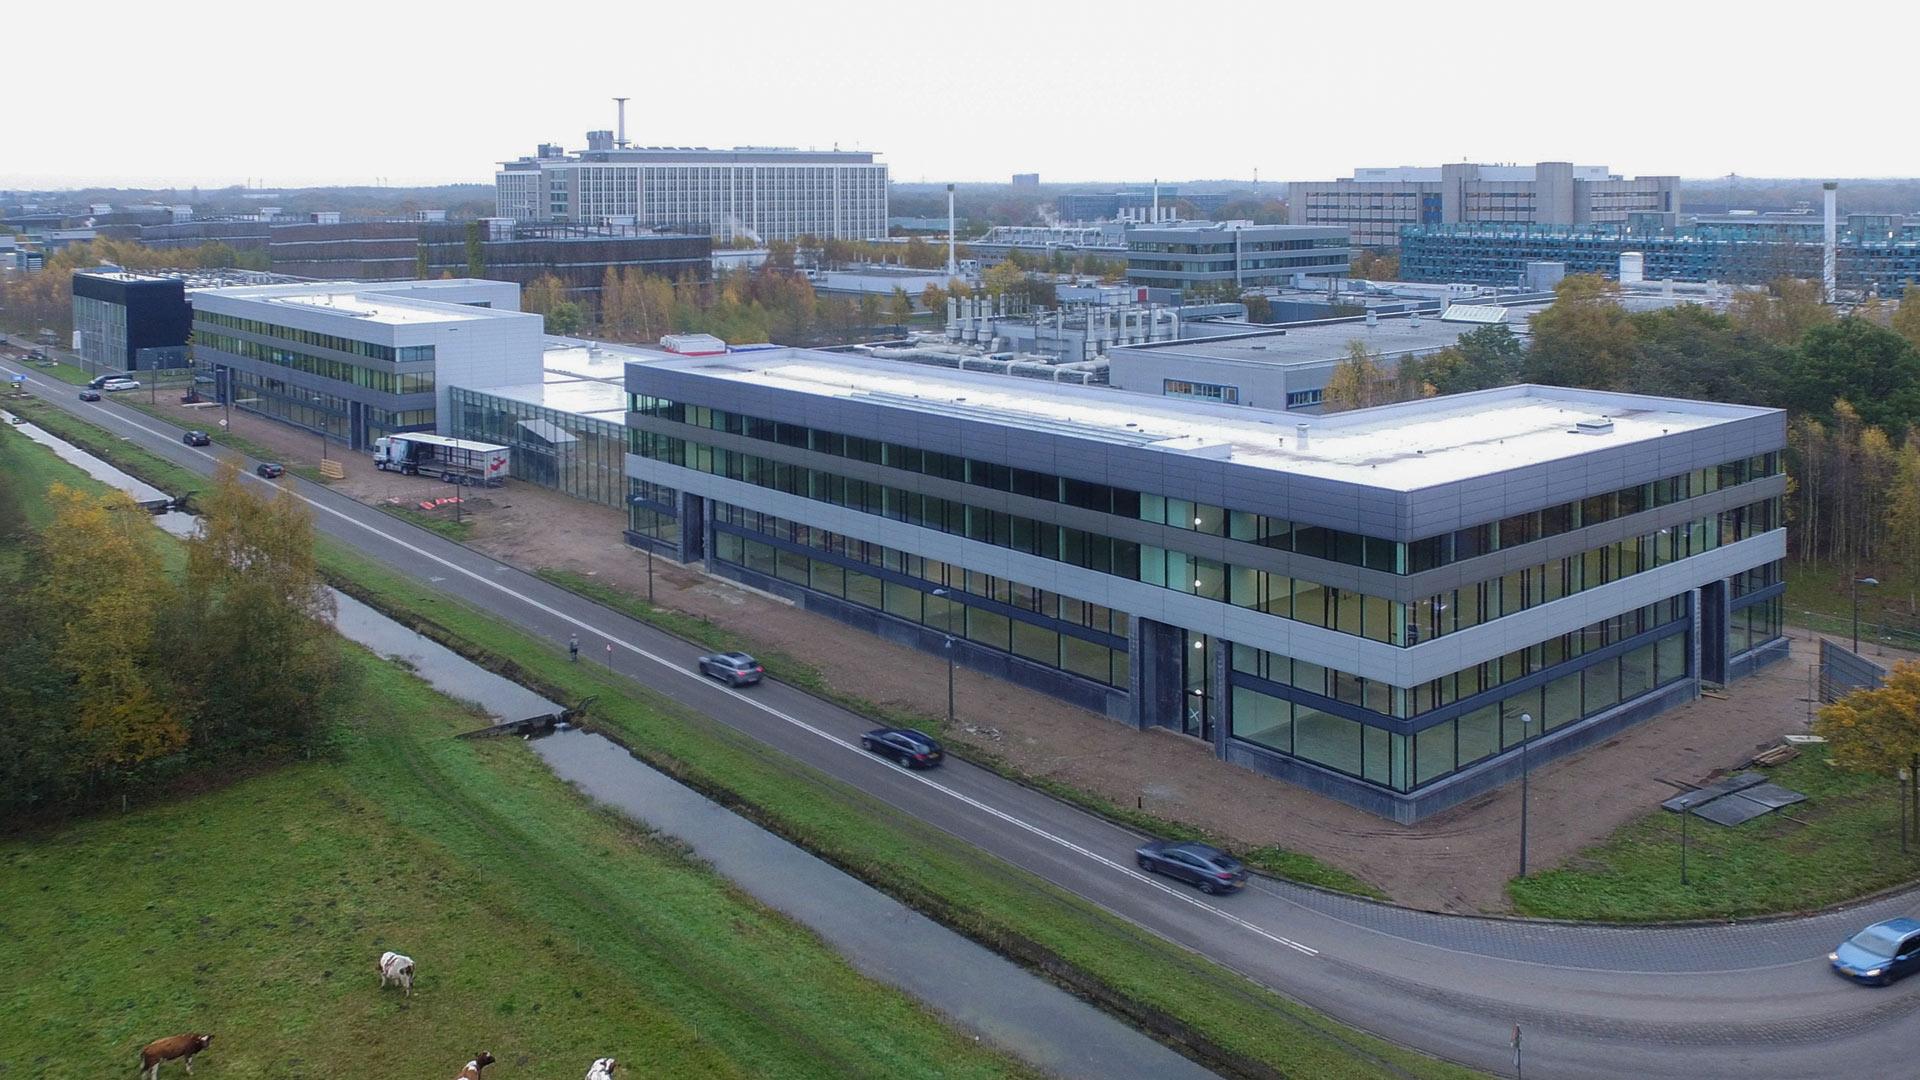 Hoogste punt Smart Industry Hub - High Tech Campus Eindhoven